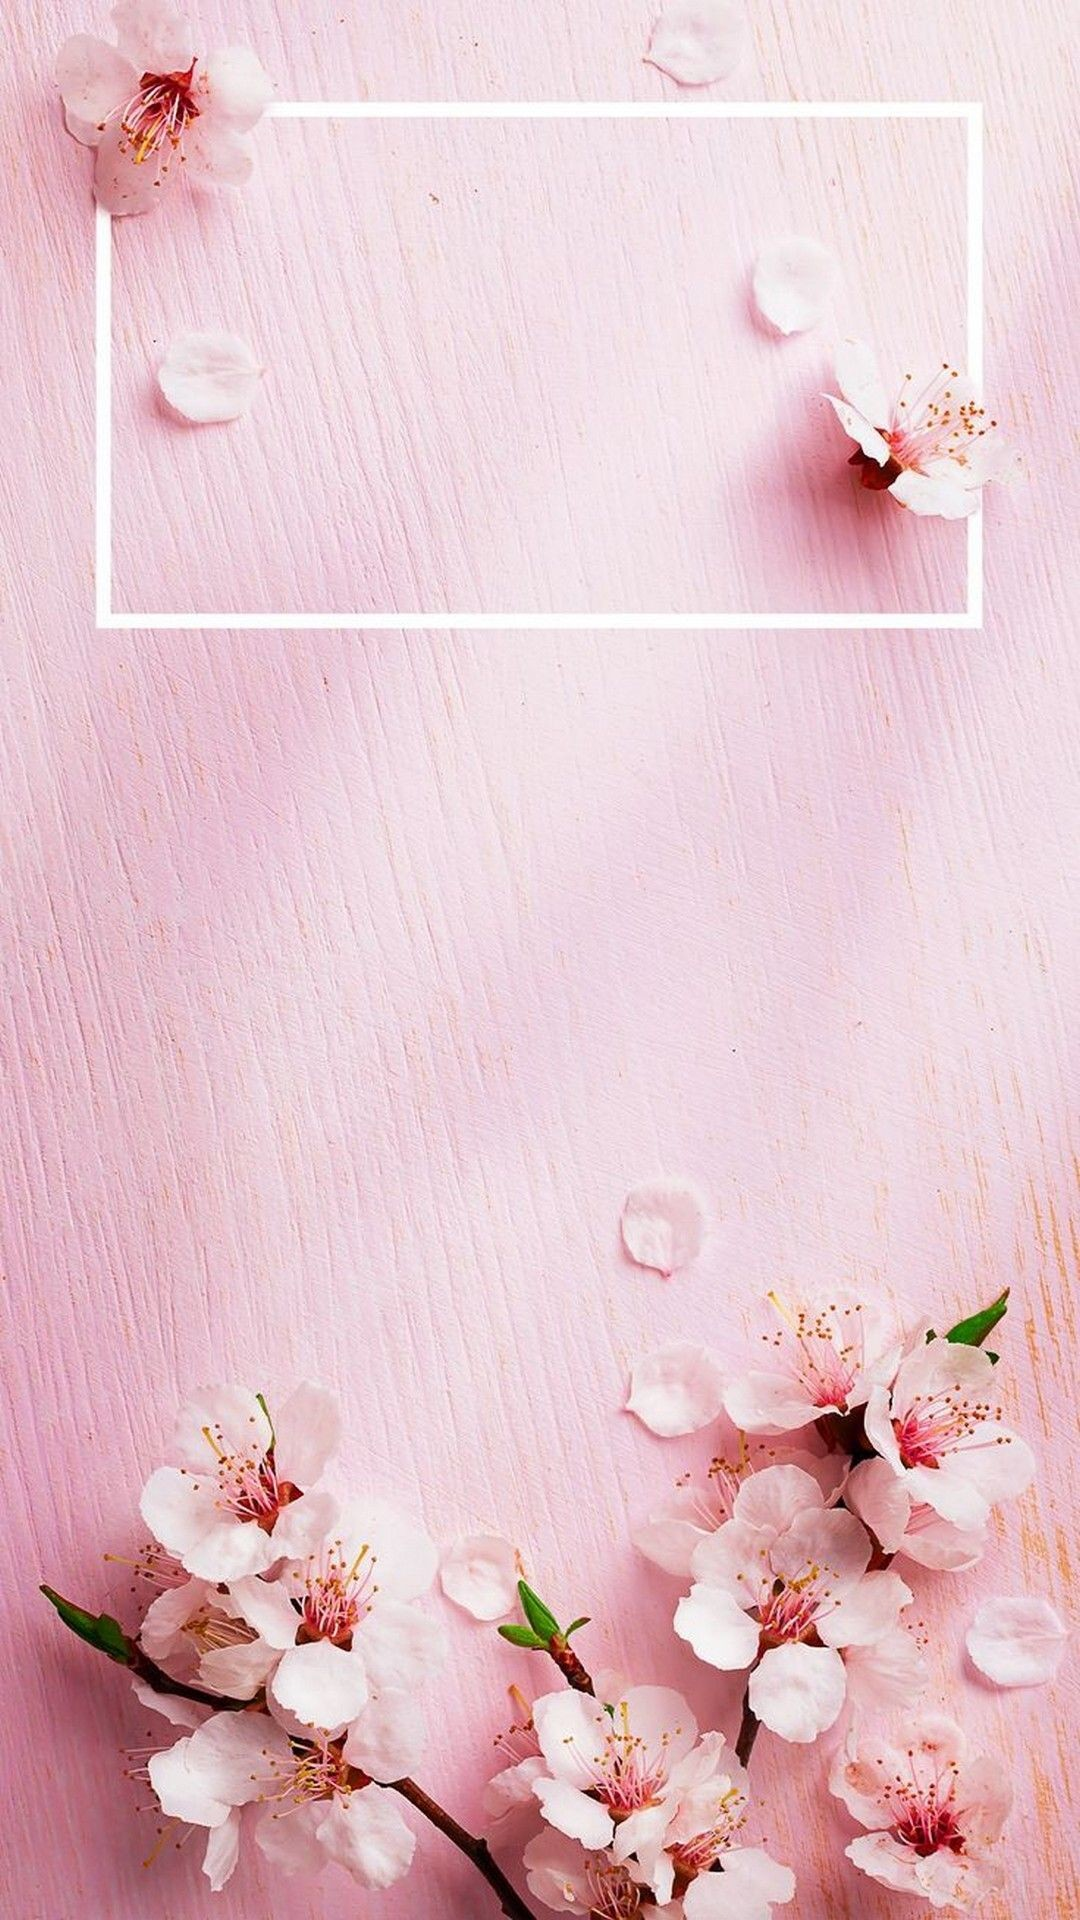 Res: 1080x1920, iPhone X Wallpaper Rose Gold Lock Screen - Best iPhone Wallpaper